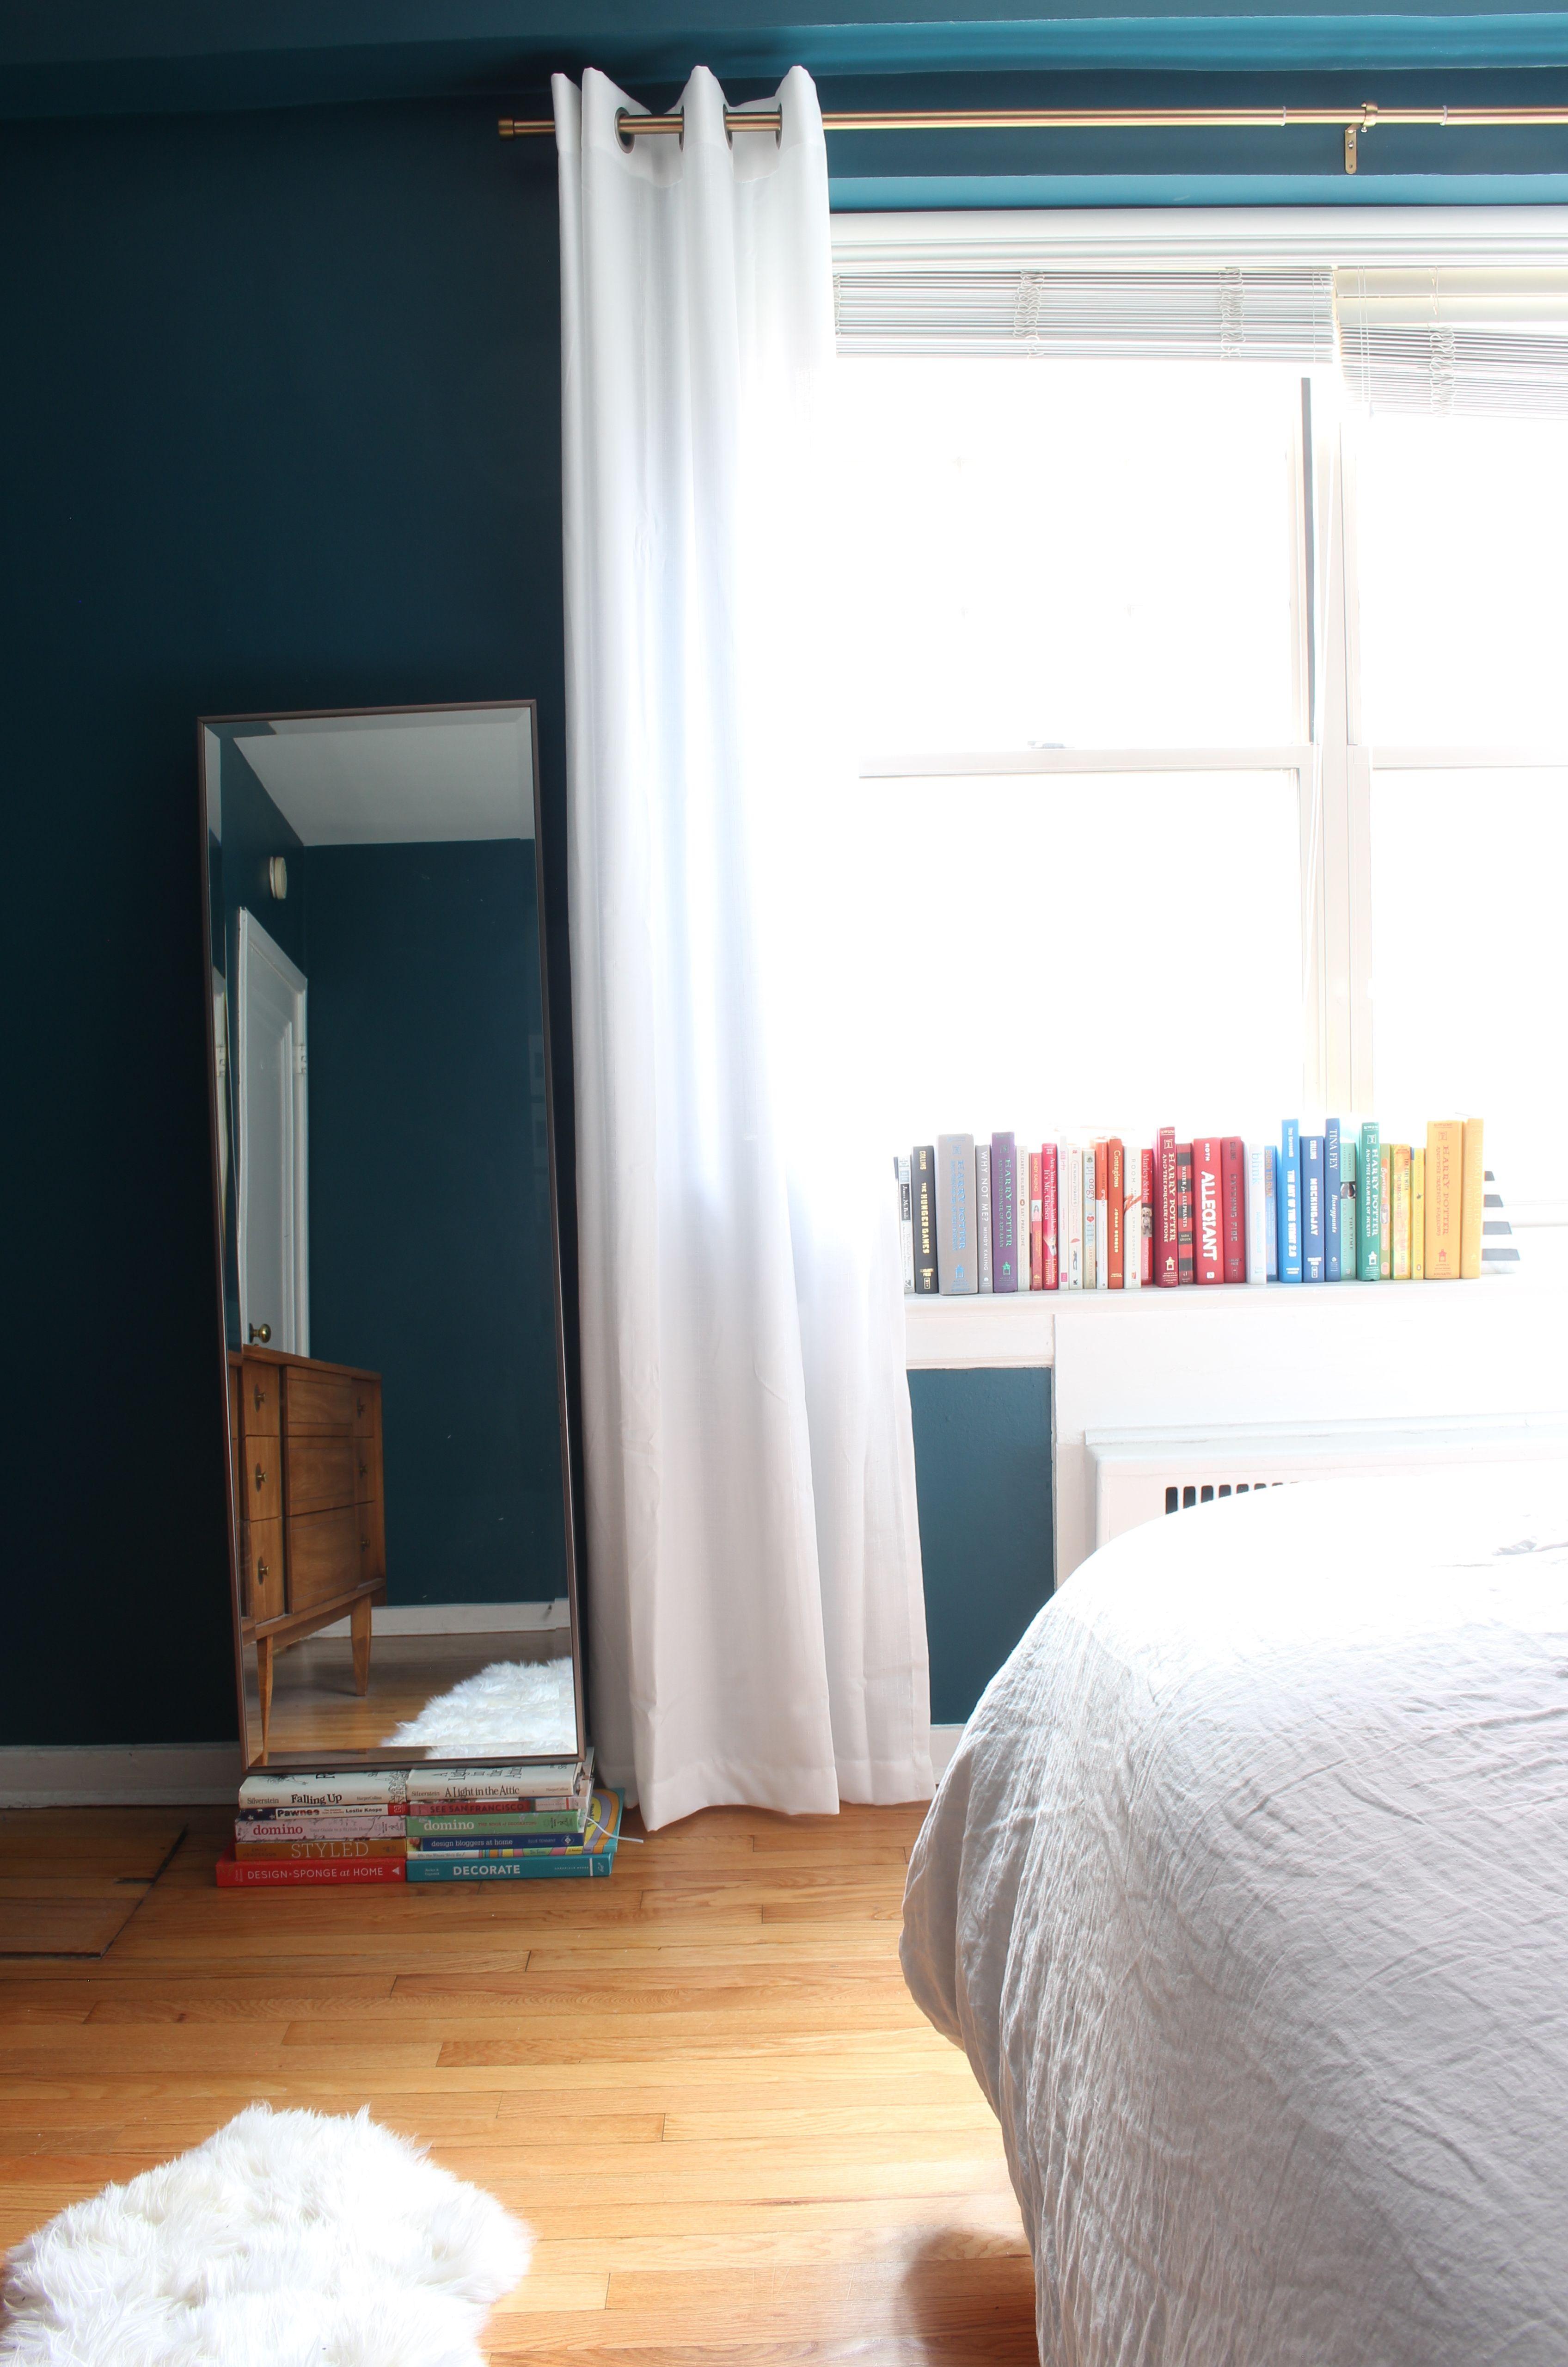 Mid Century Moody Bedroom Mid Century Modern Style Bedroom With Dark Teal